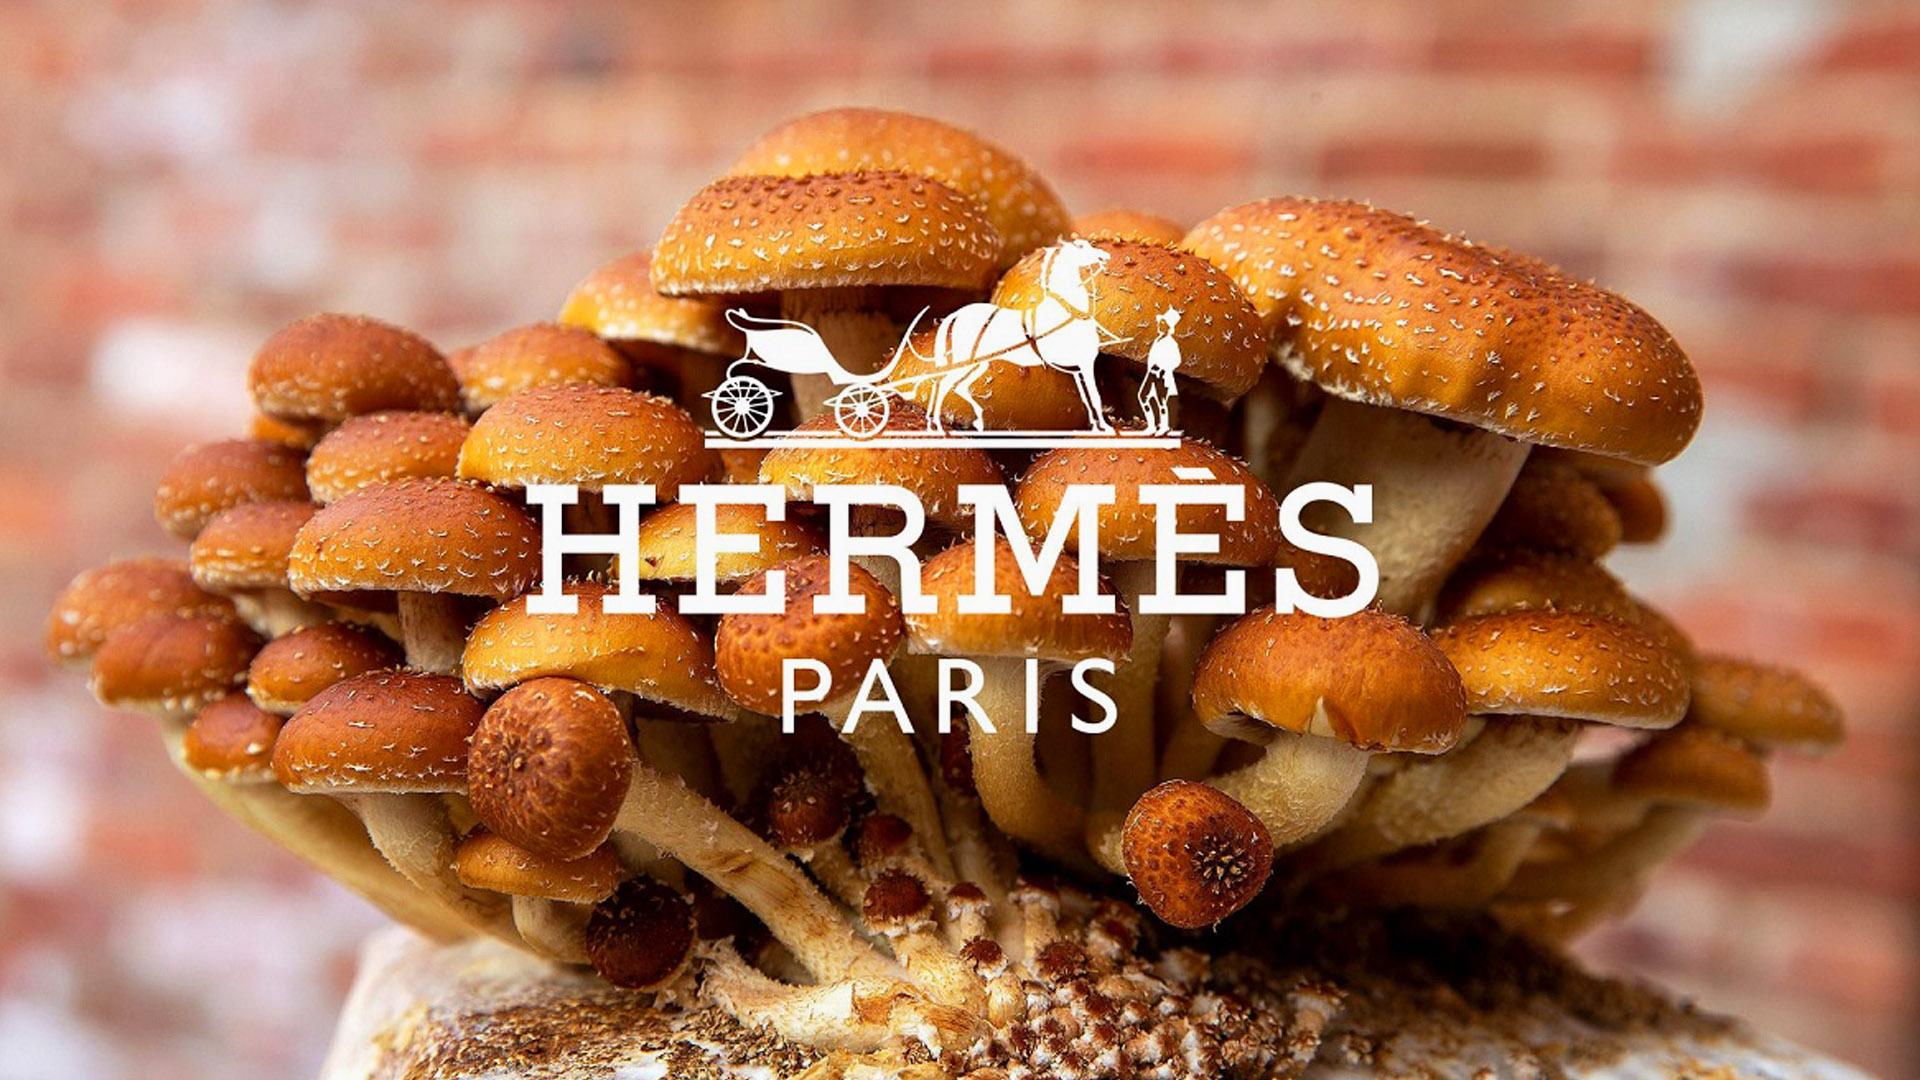 Ecopelle ricavata dai funghi: Stella McCartney ed Hermes in prima linea